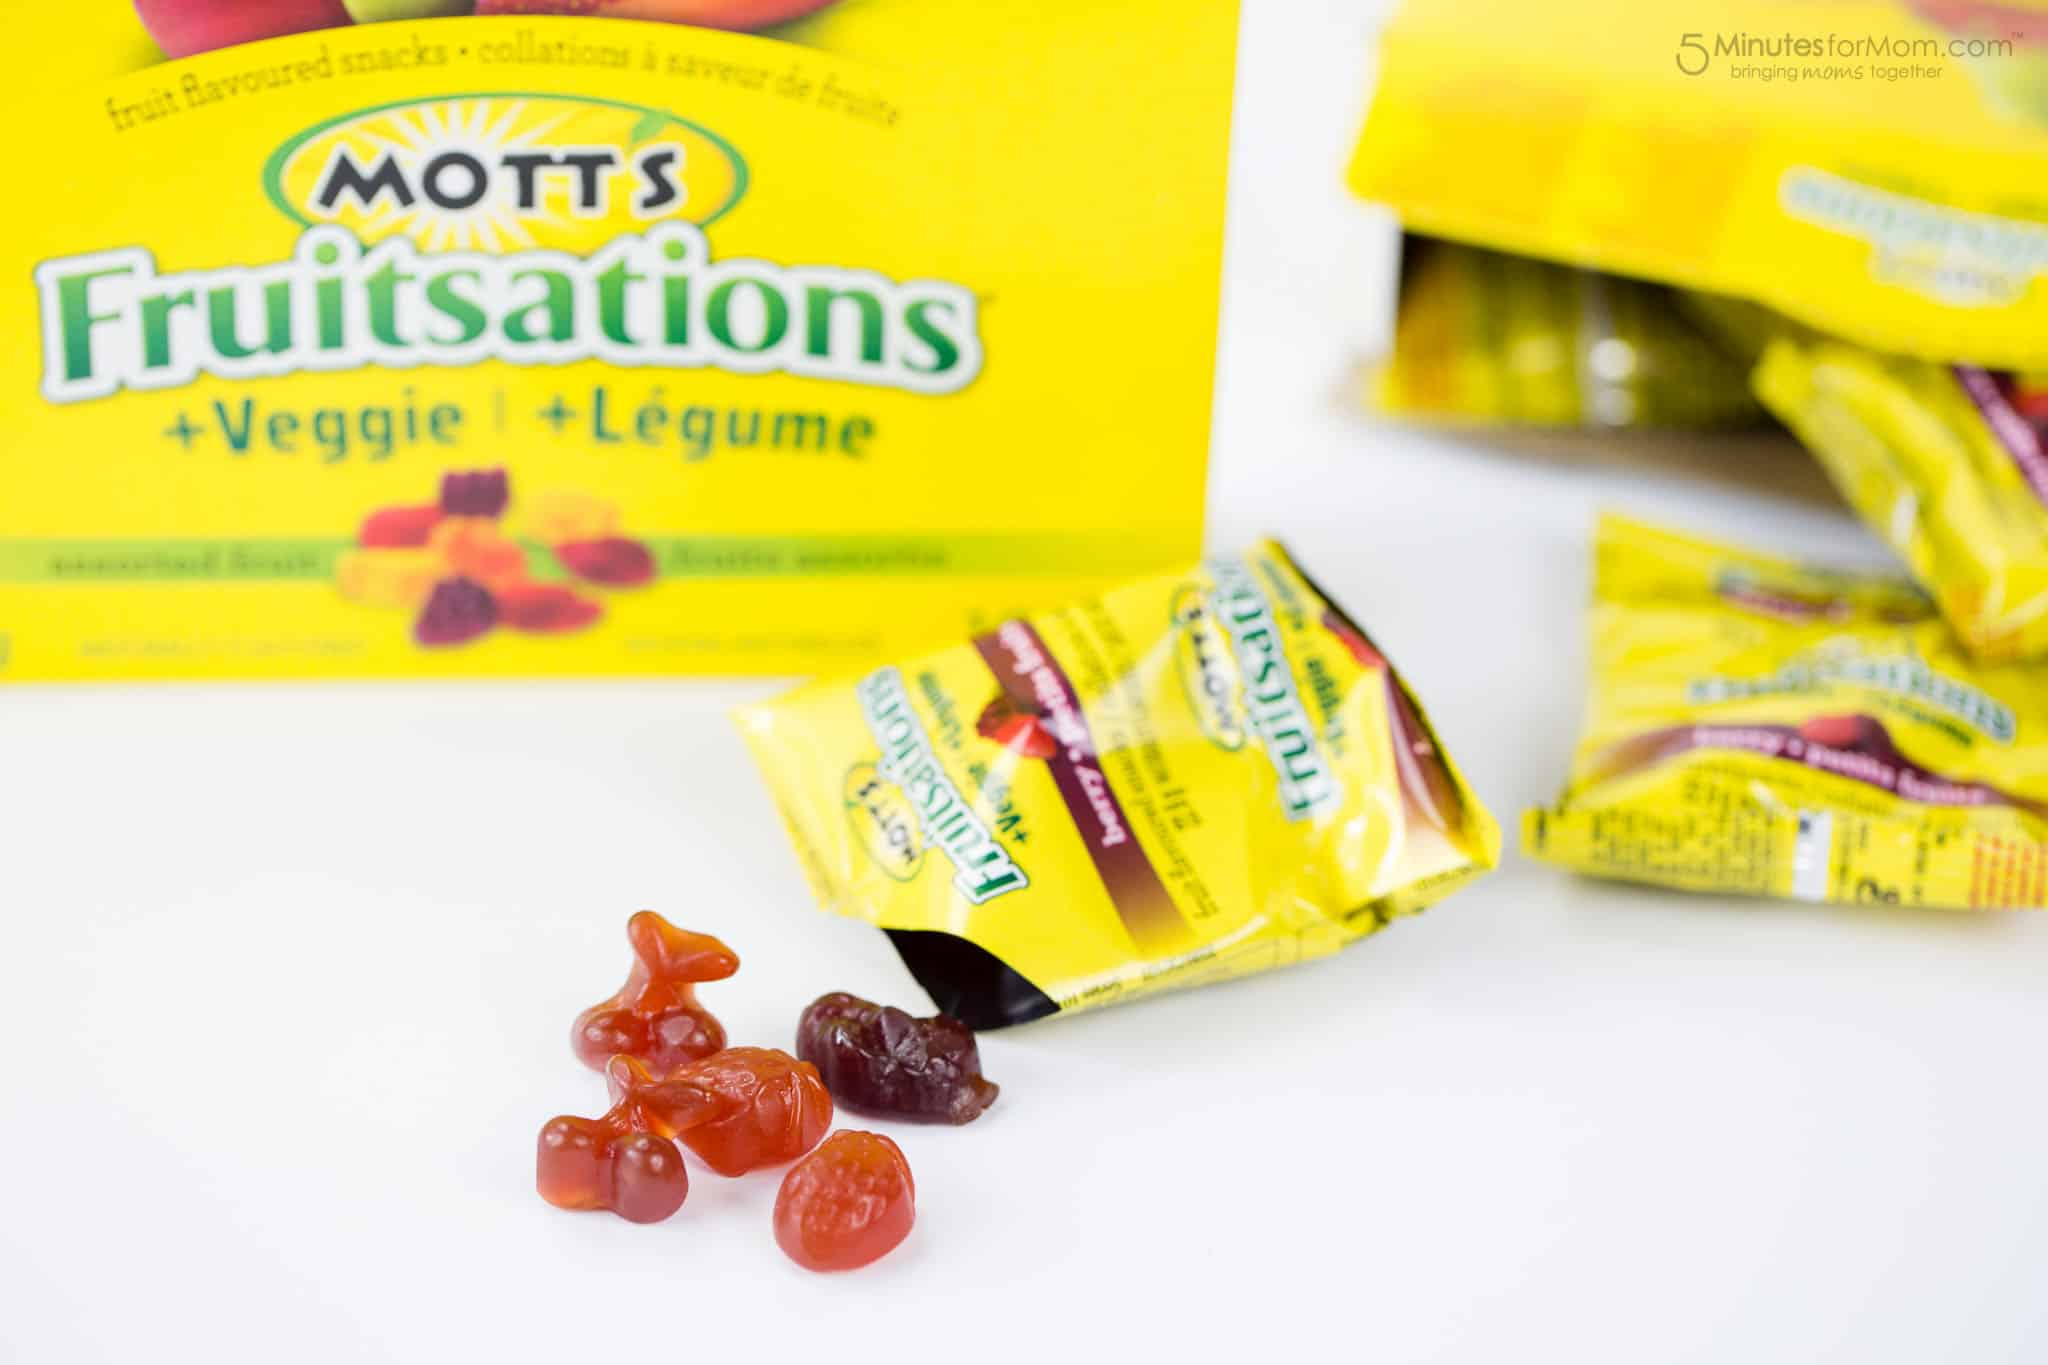 Motts Fruitsations-1-9159